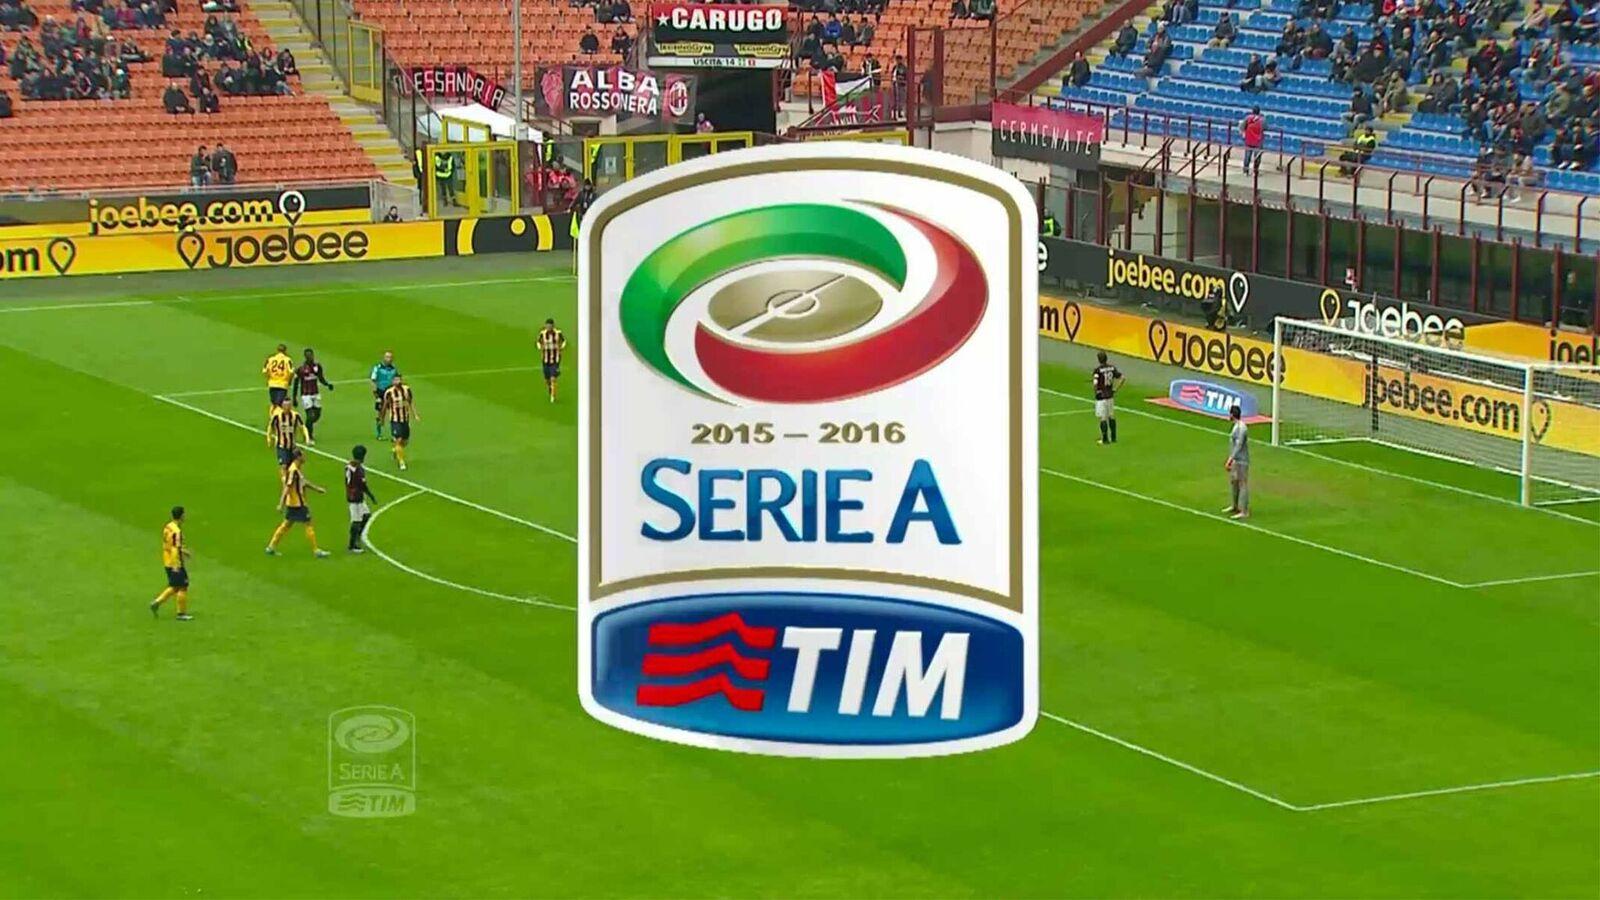 Serie A TIM, 14 stadi italiani